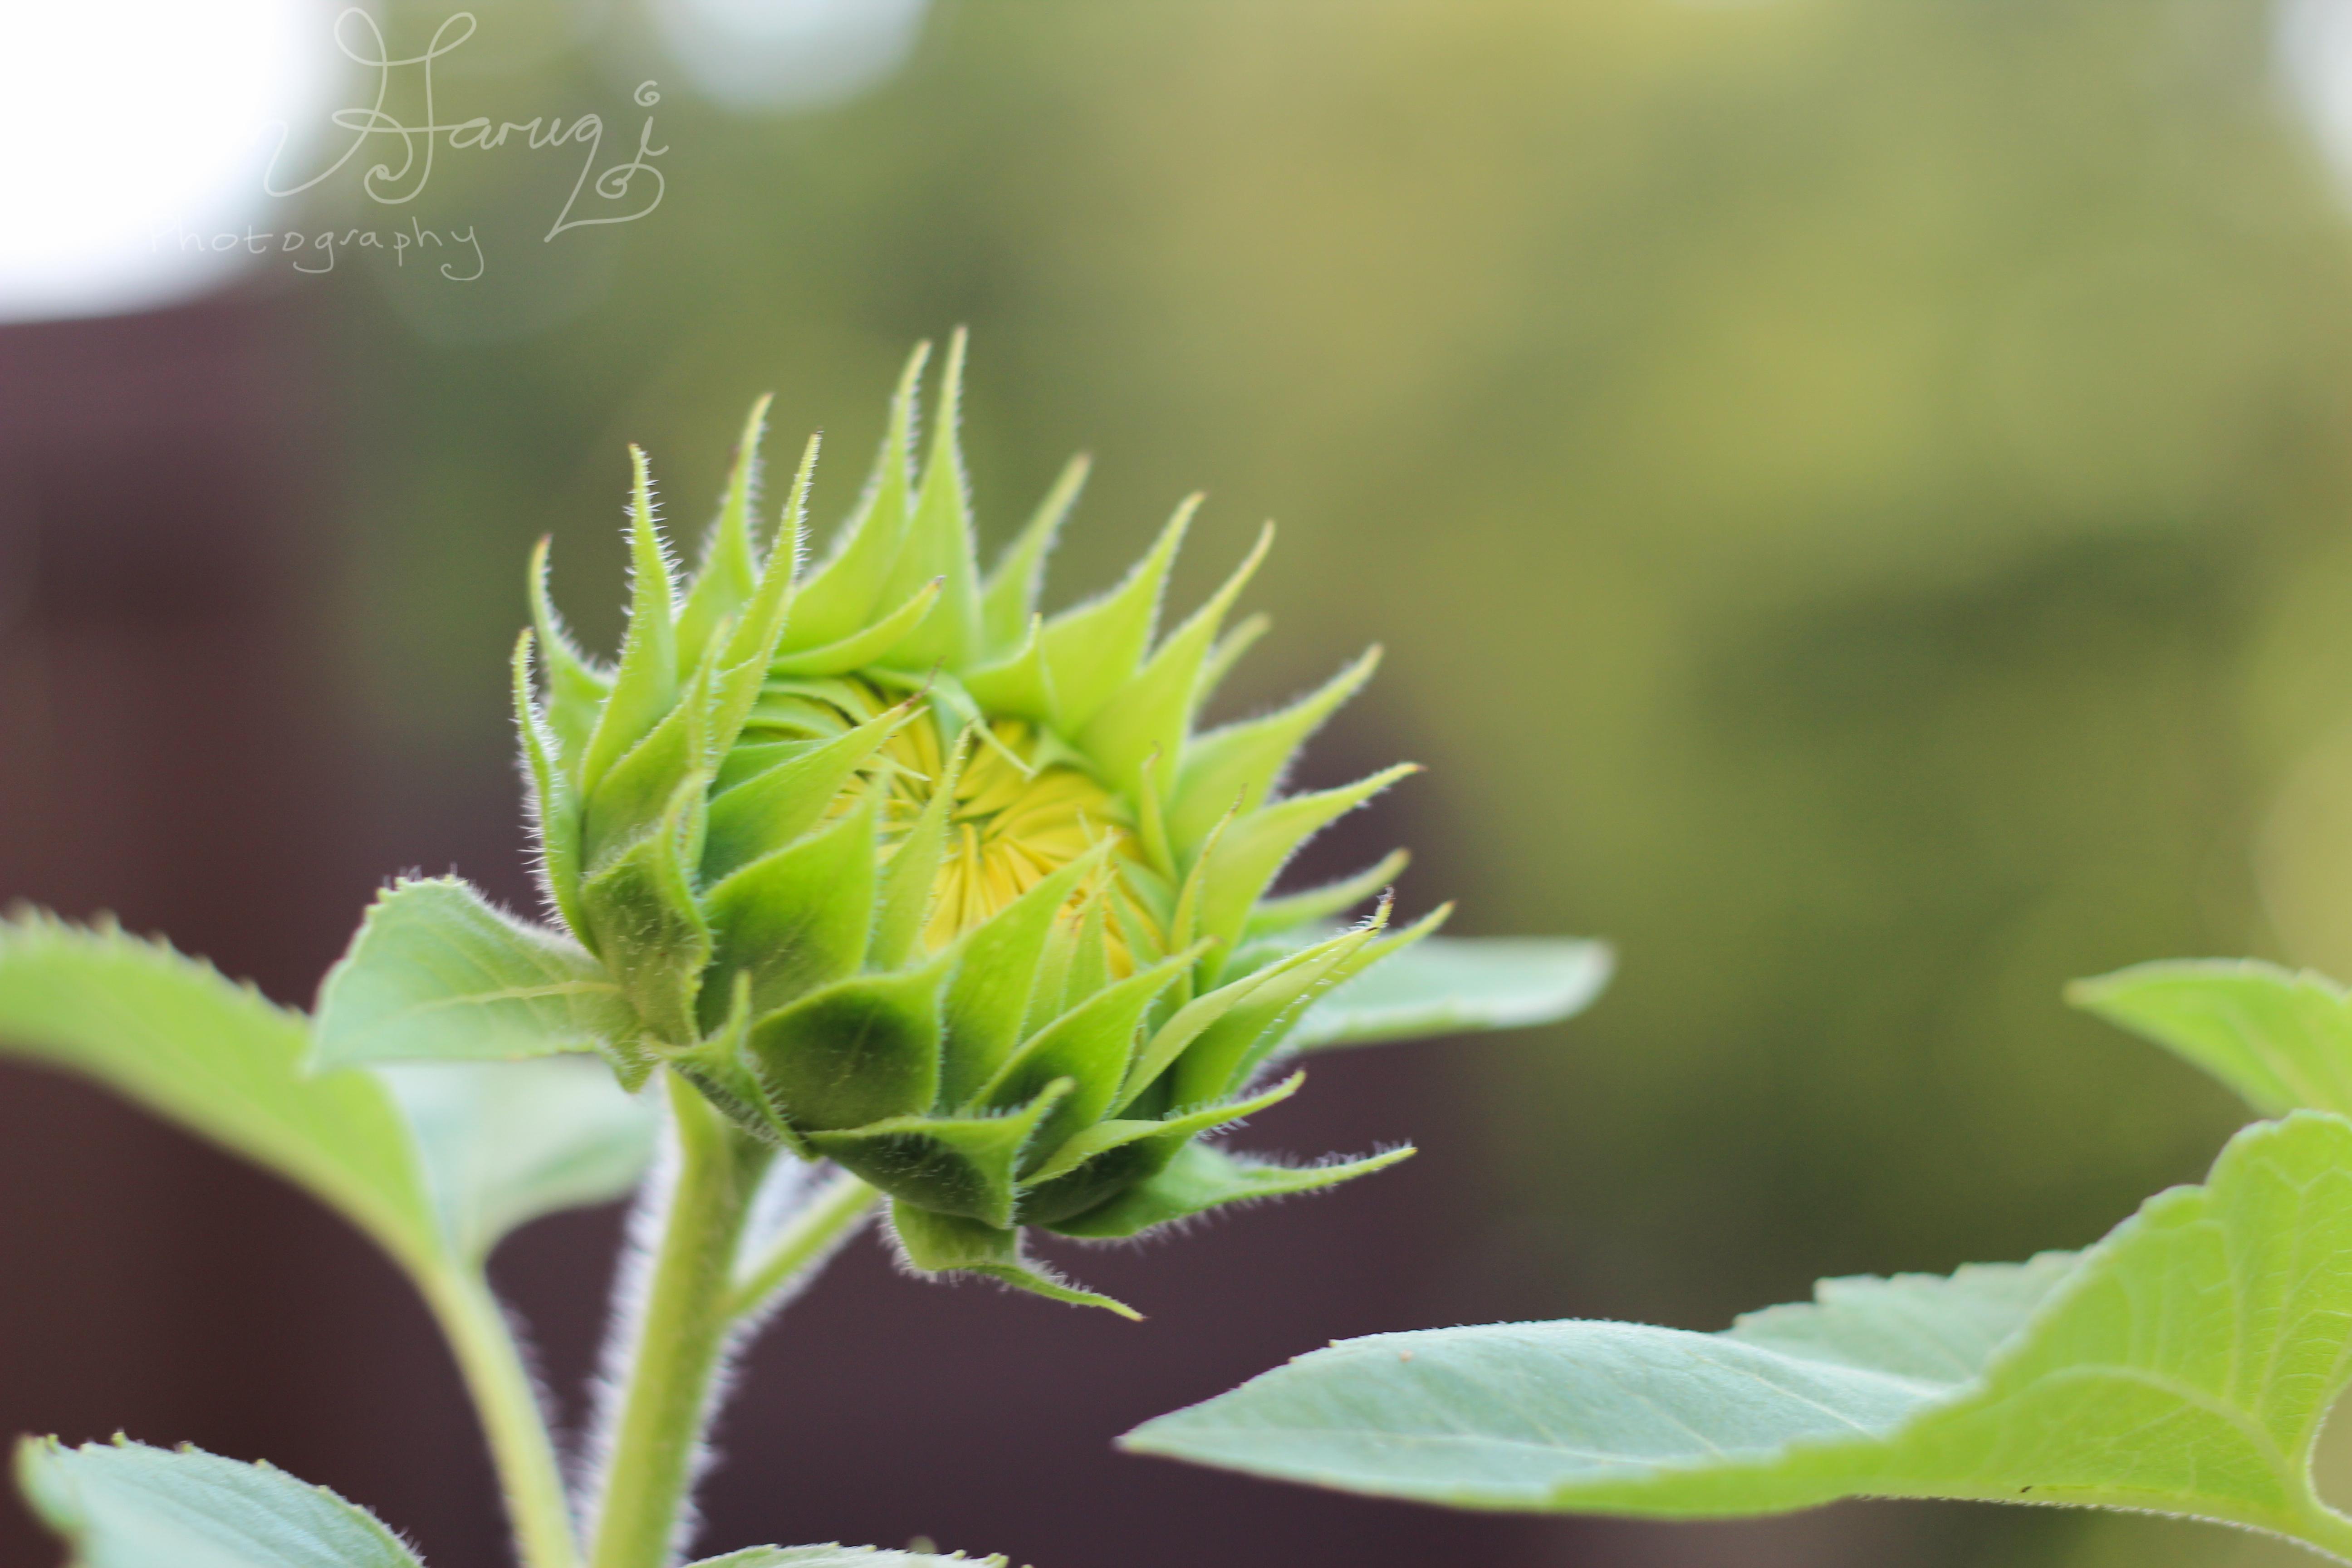 Sunflower Buds | Emerald Studio Photography  |Sunflower Bud